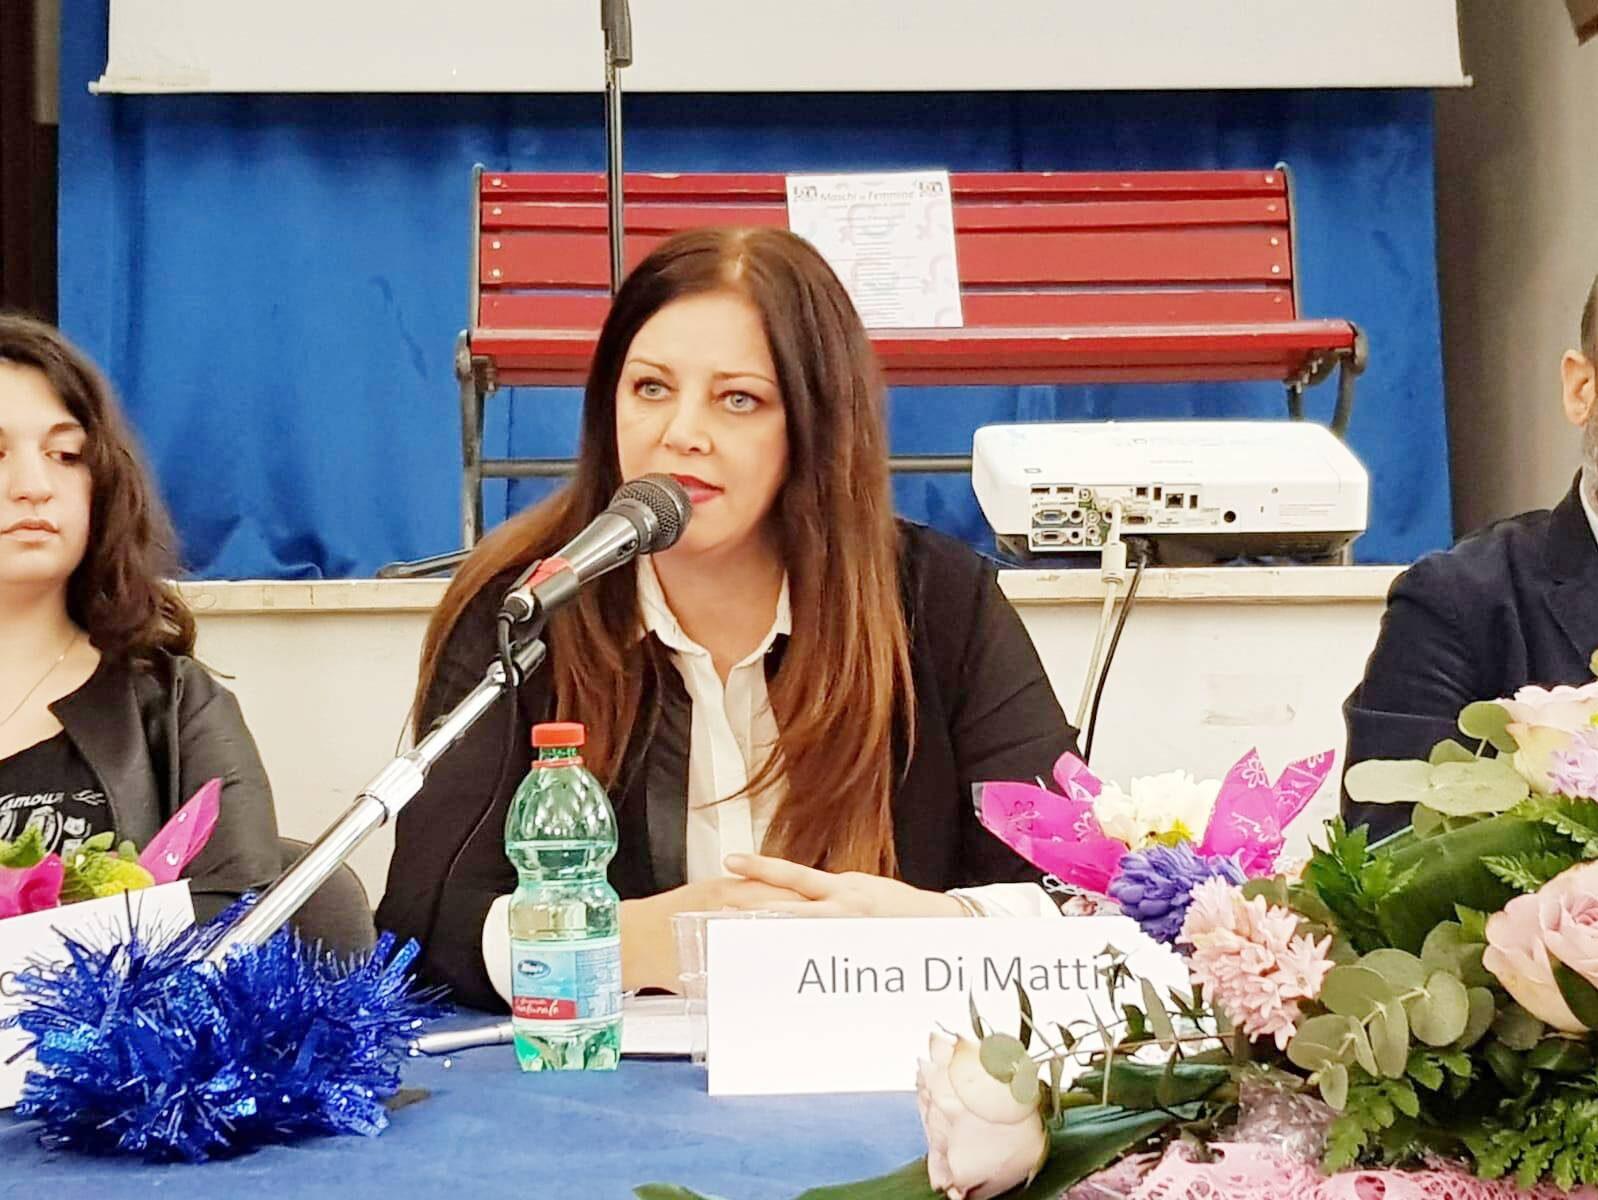 Alina Di Mattia Convegno